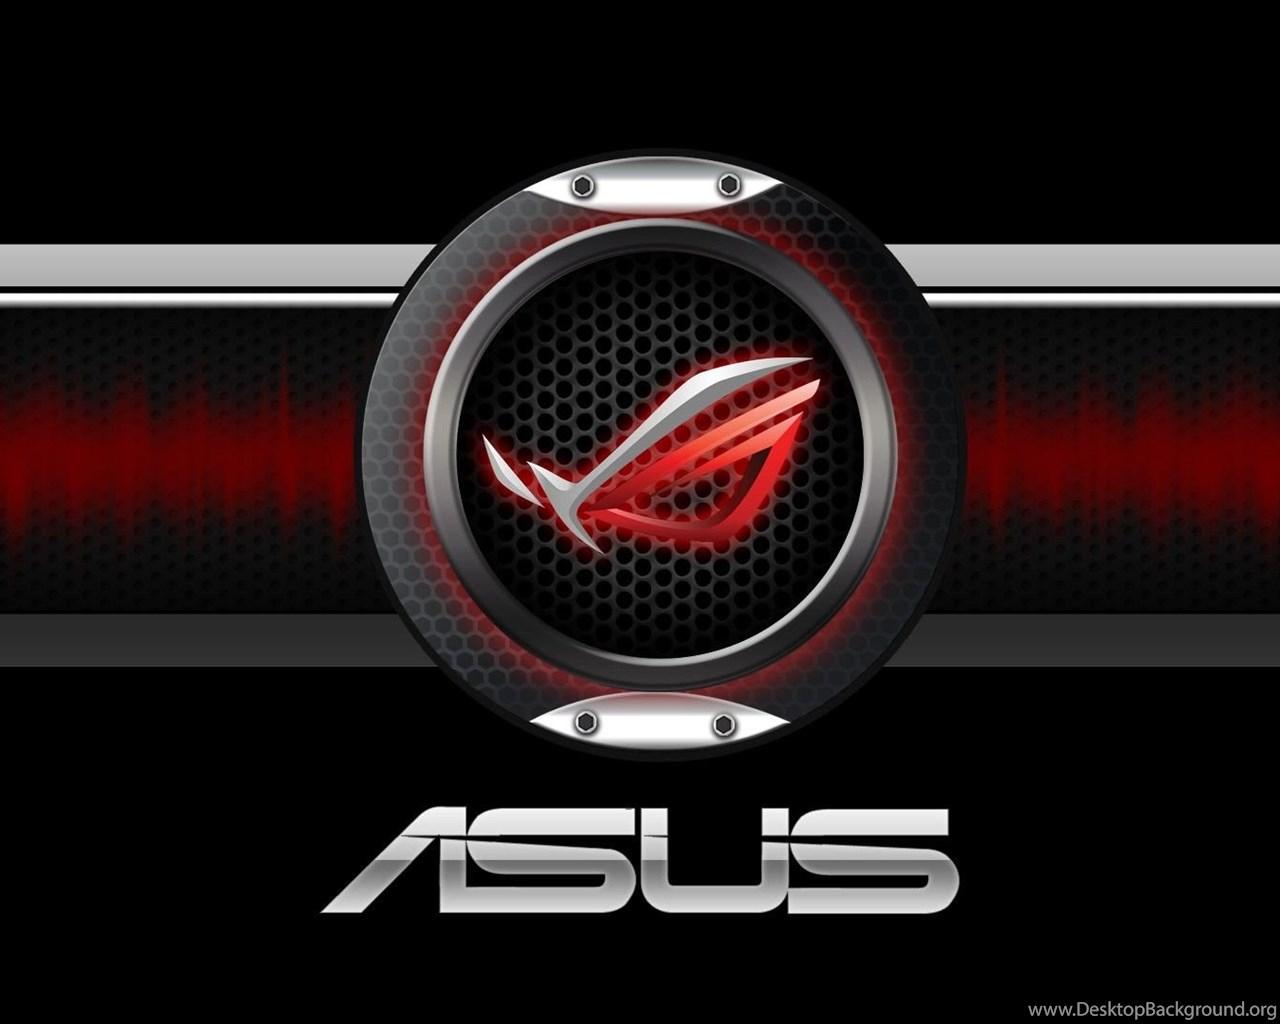 Asus Wallpapers 1080p HD 569 Seo Desktop Background